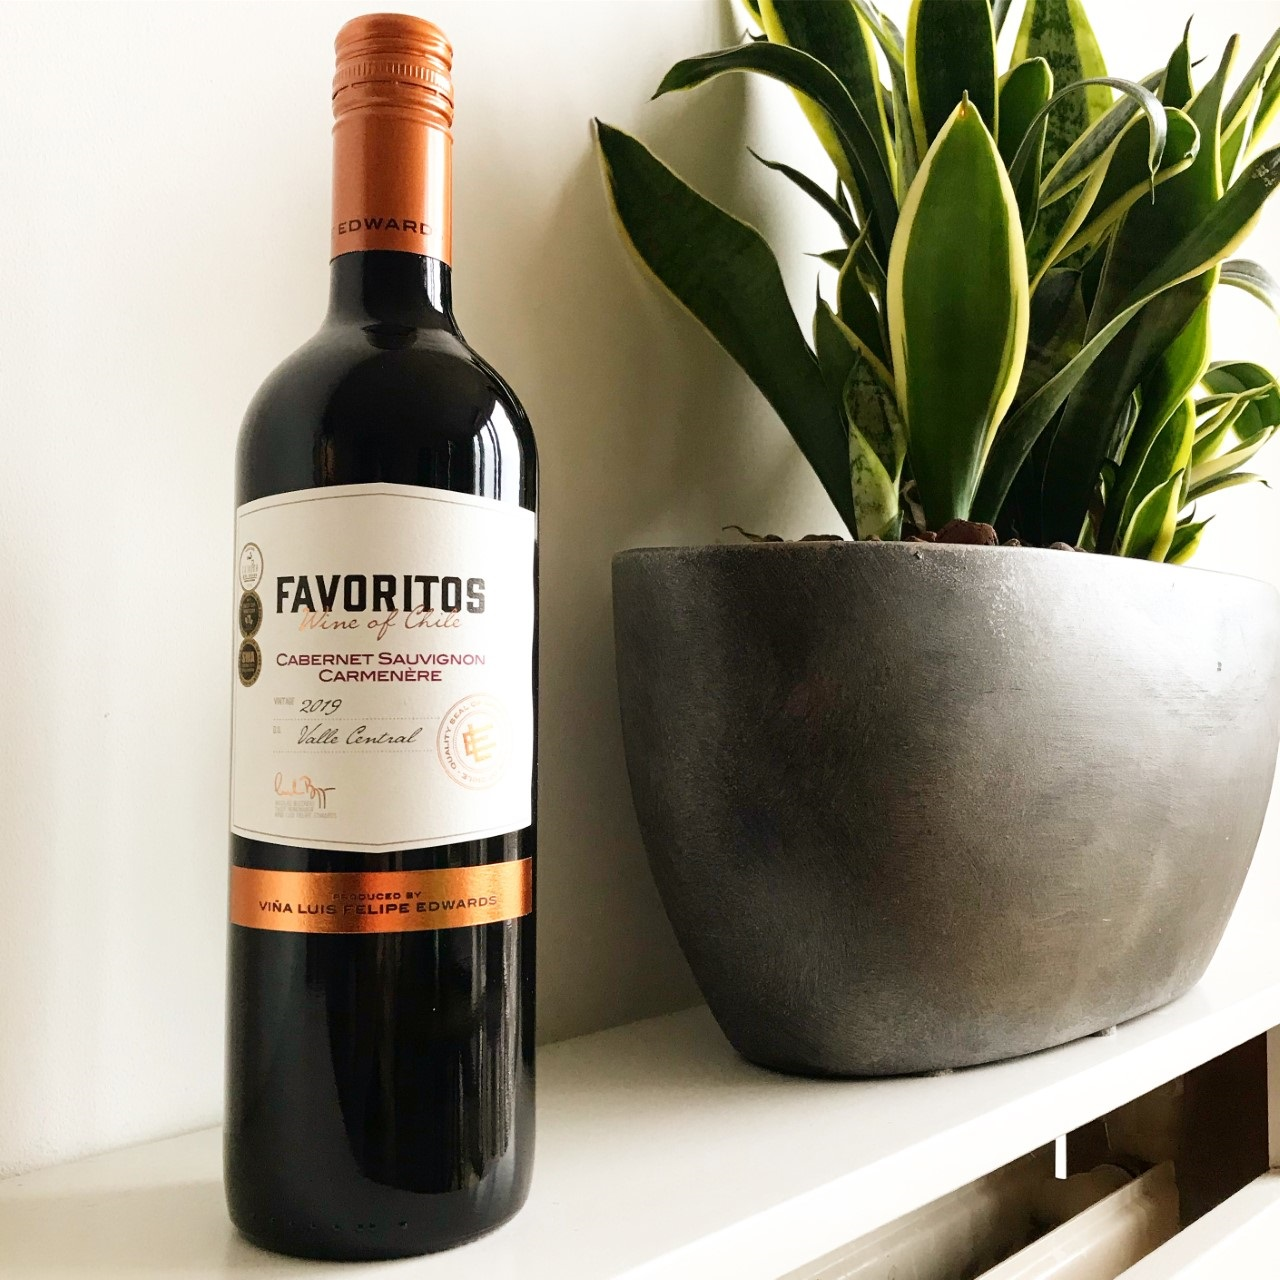 Wijn 3 - favoritos